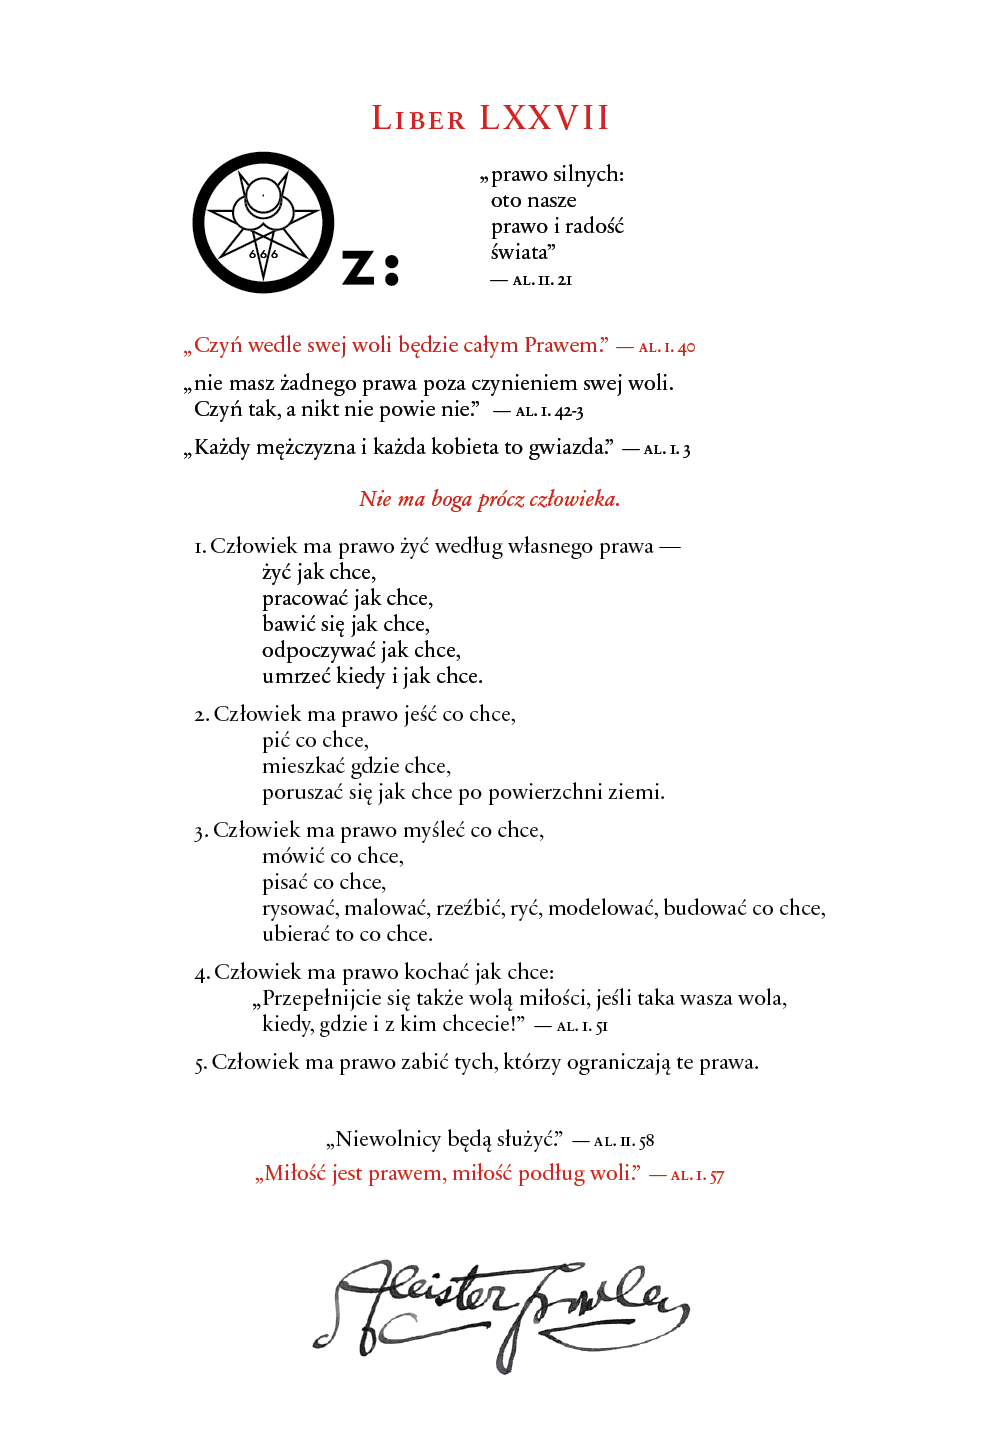 Liber OZ in Polish